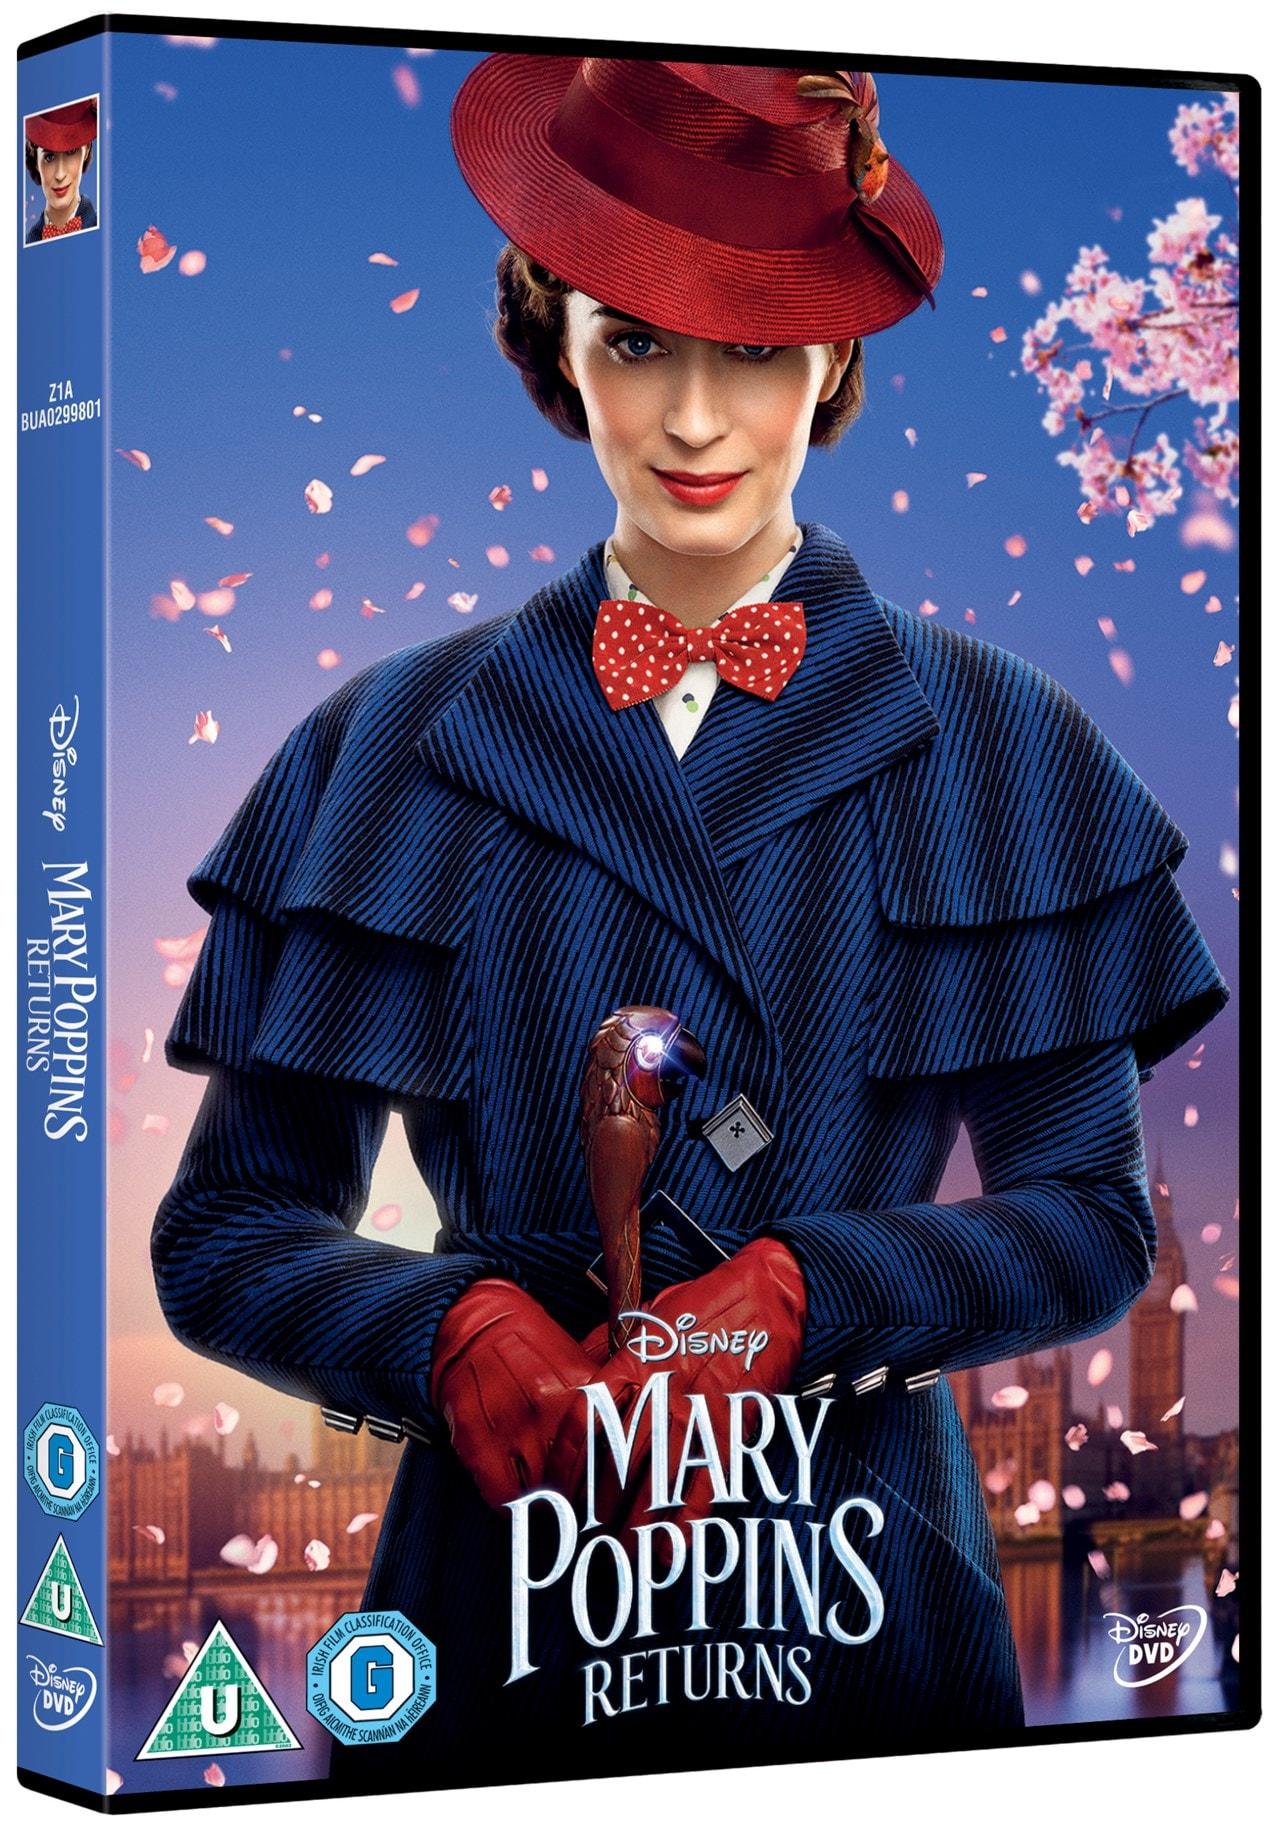 Mary Poppins Returns - 4